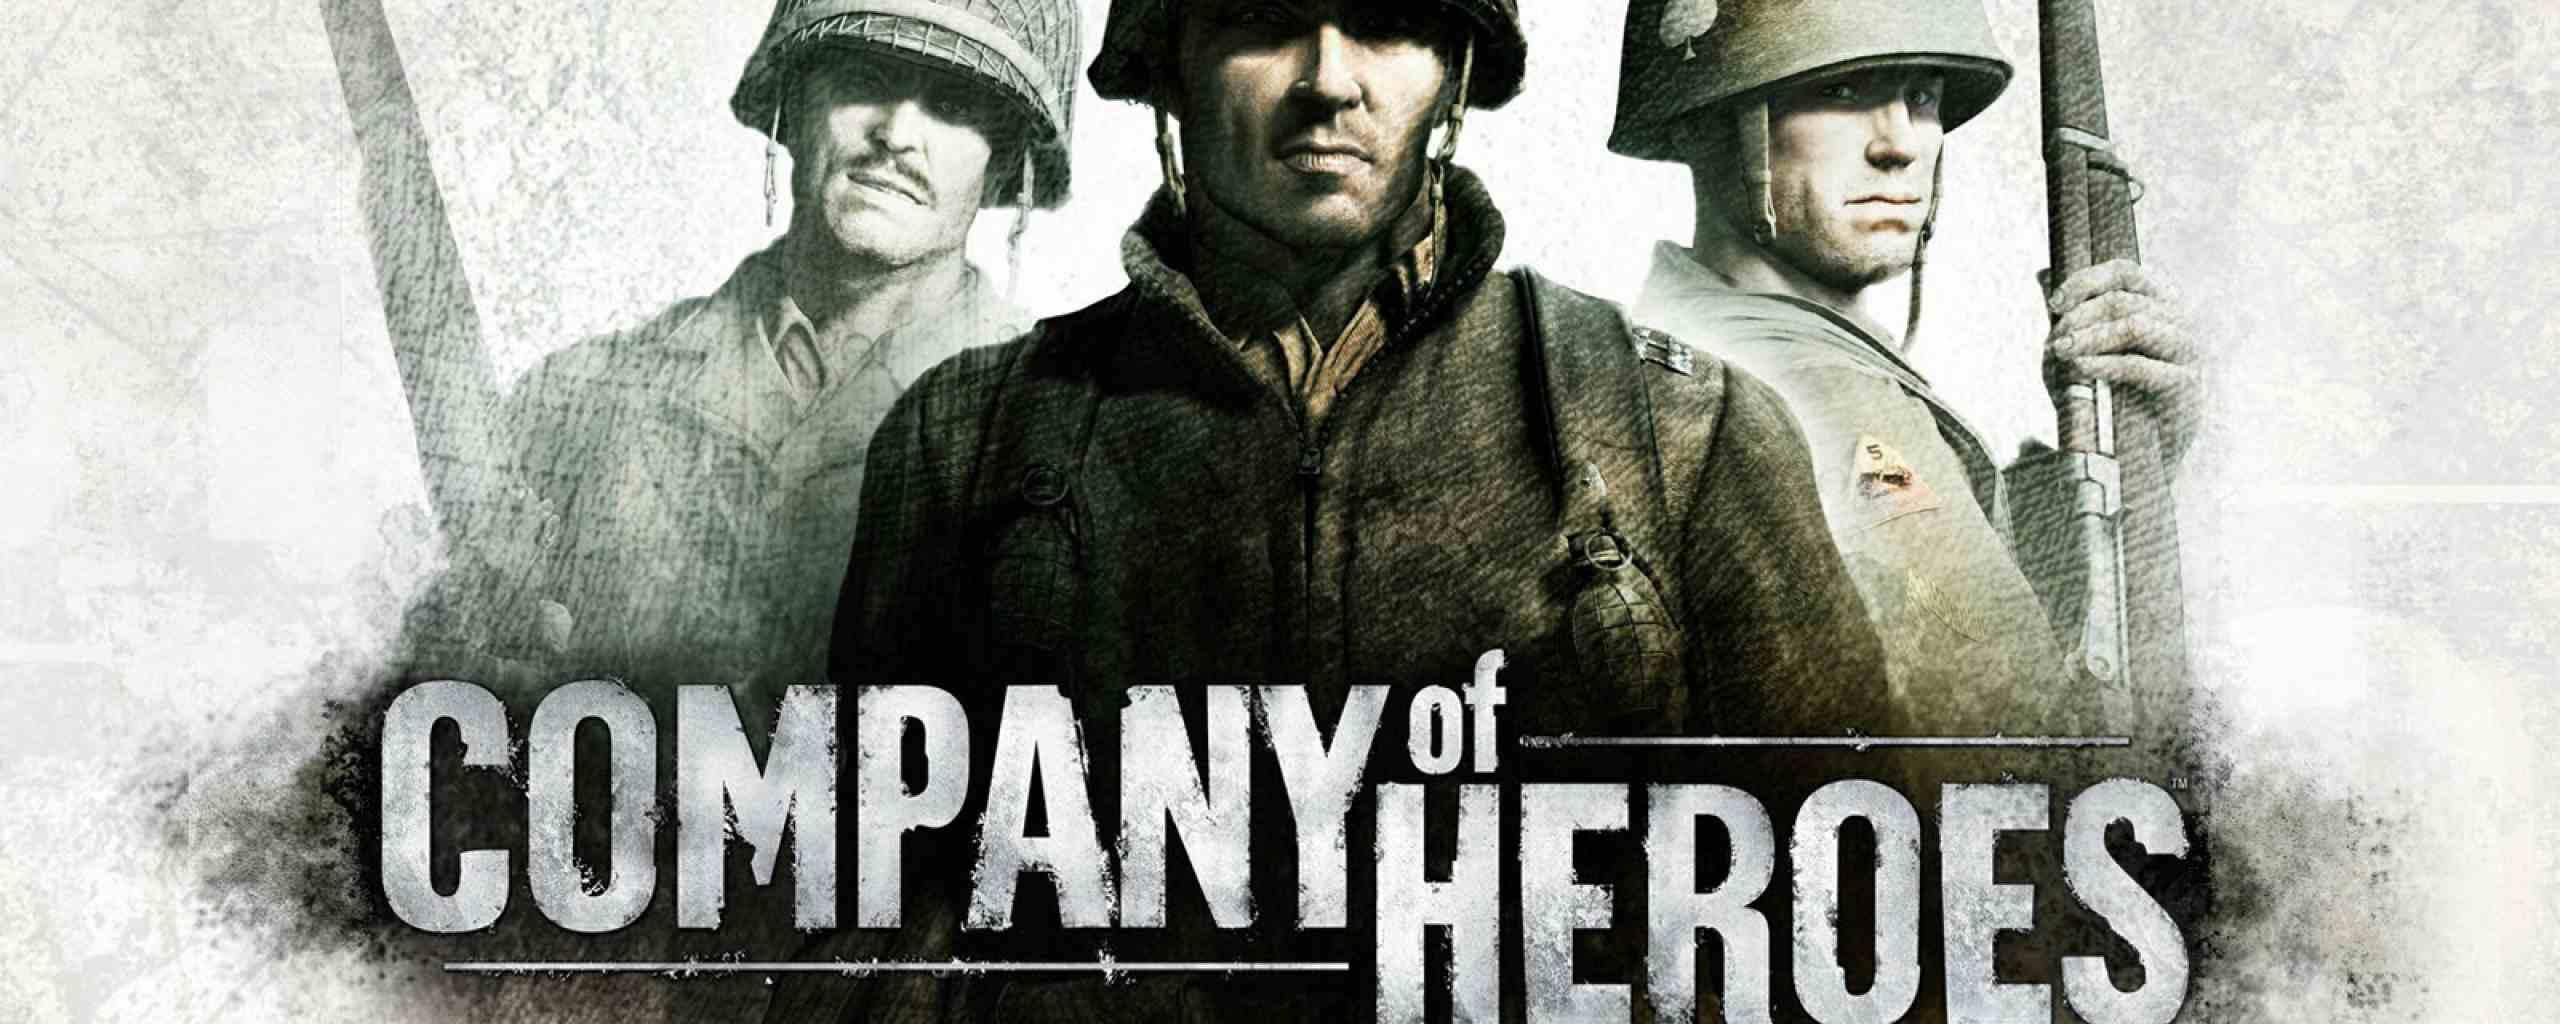 Company of Heroes Series